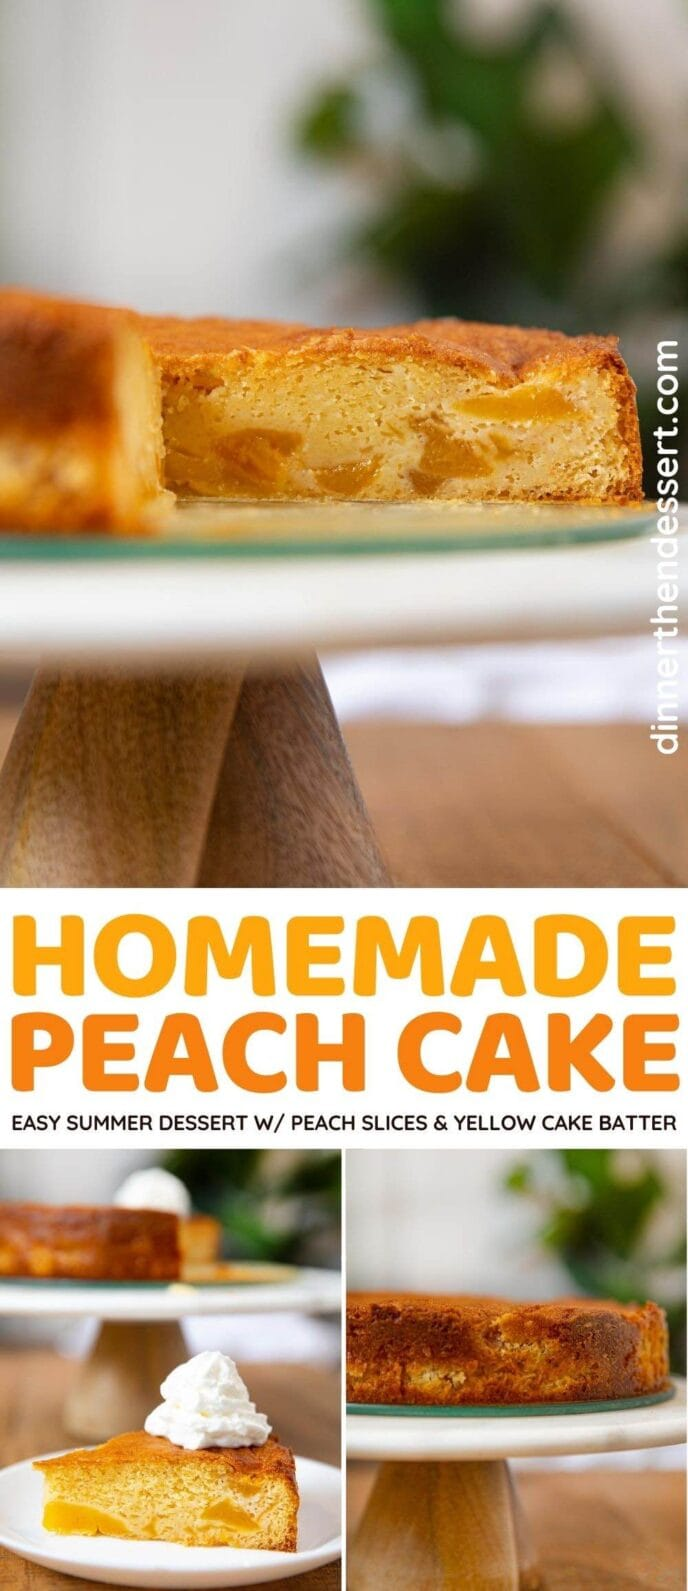 Peach Cake collage